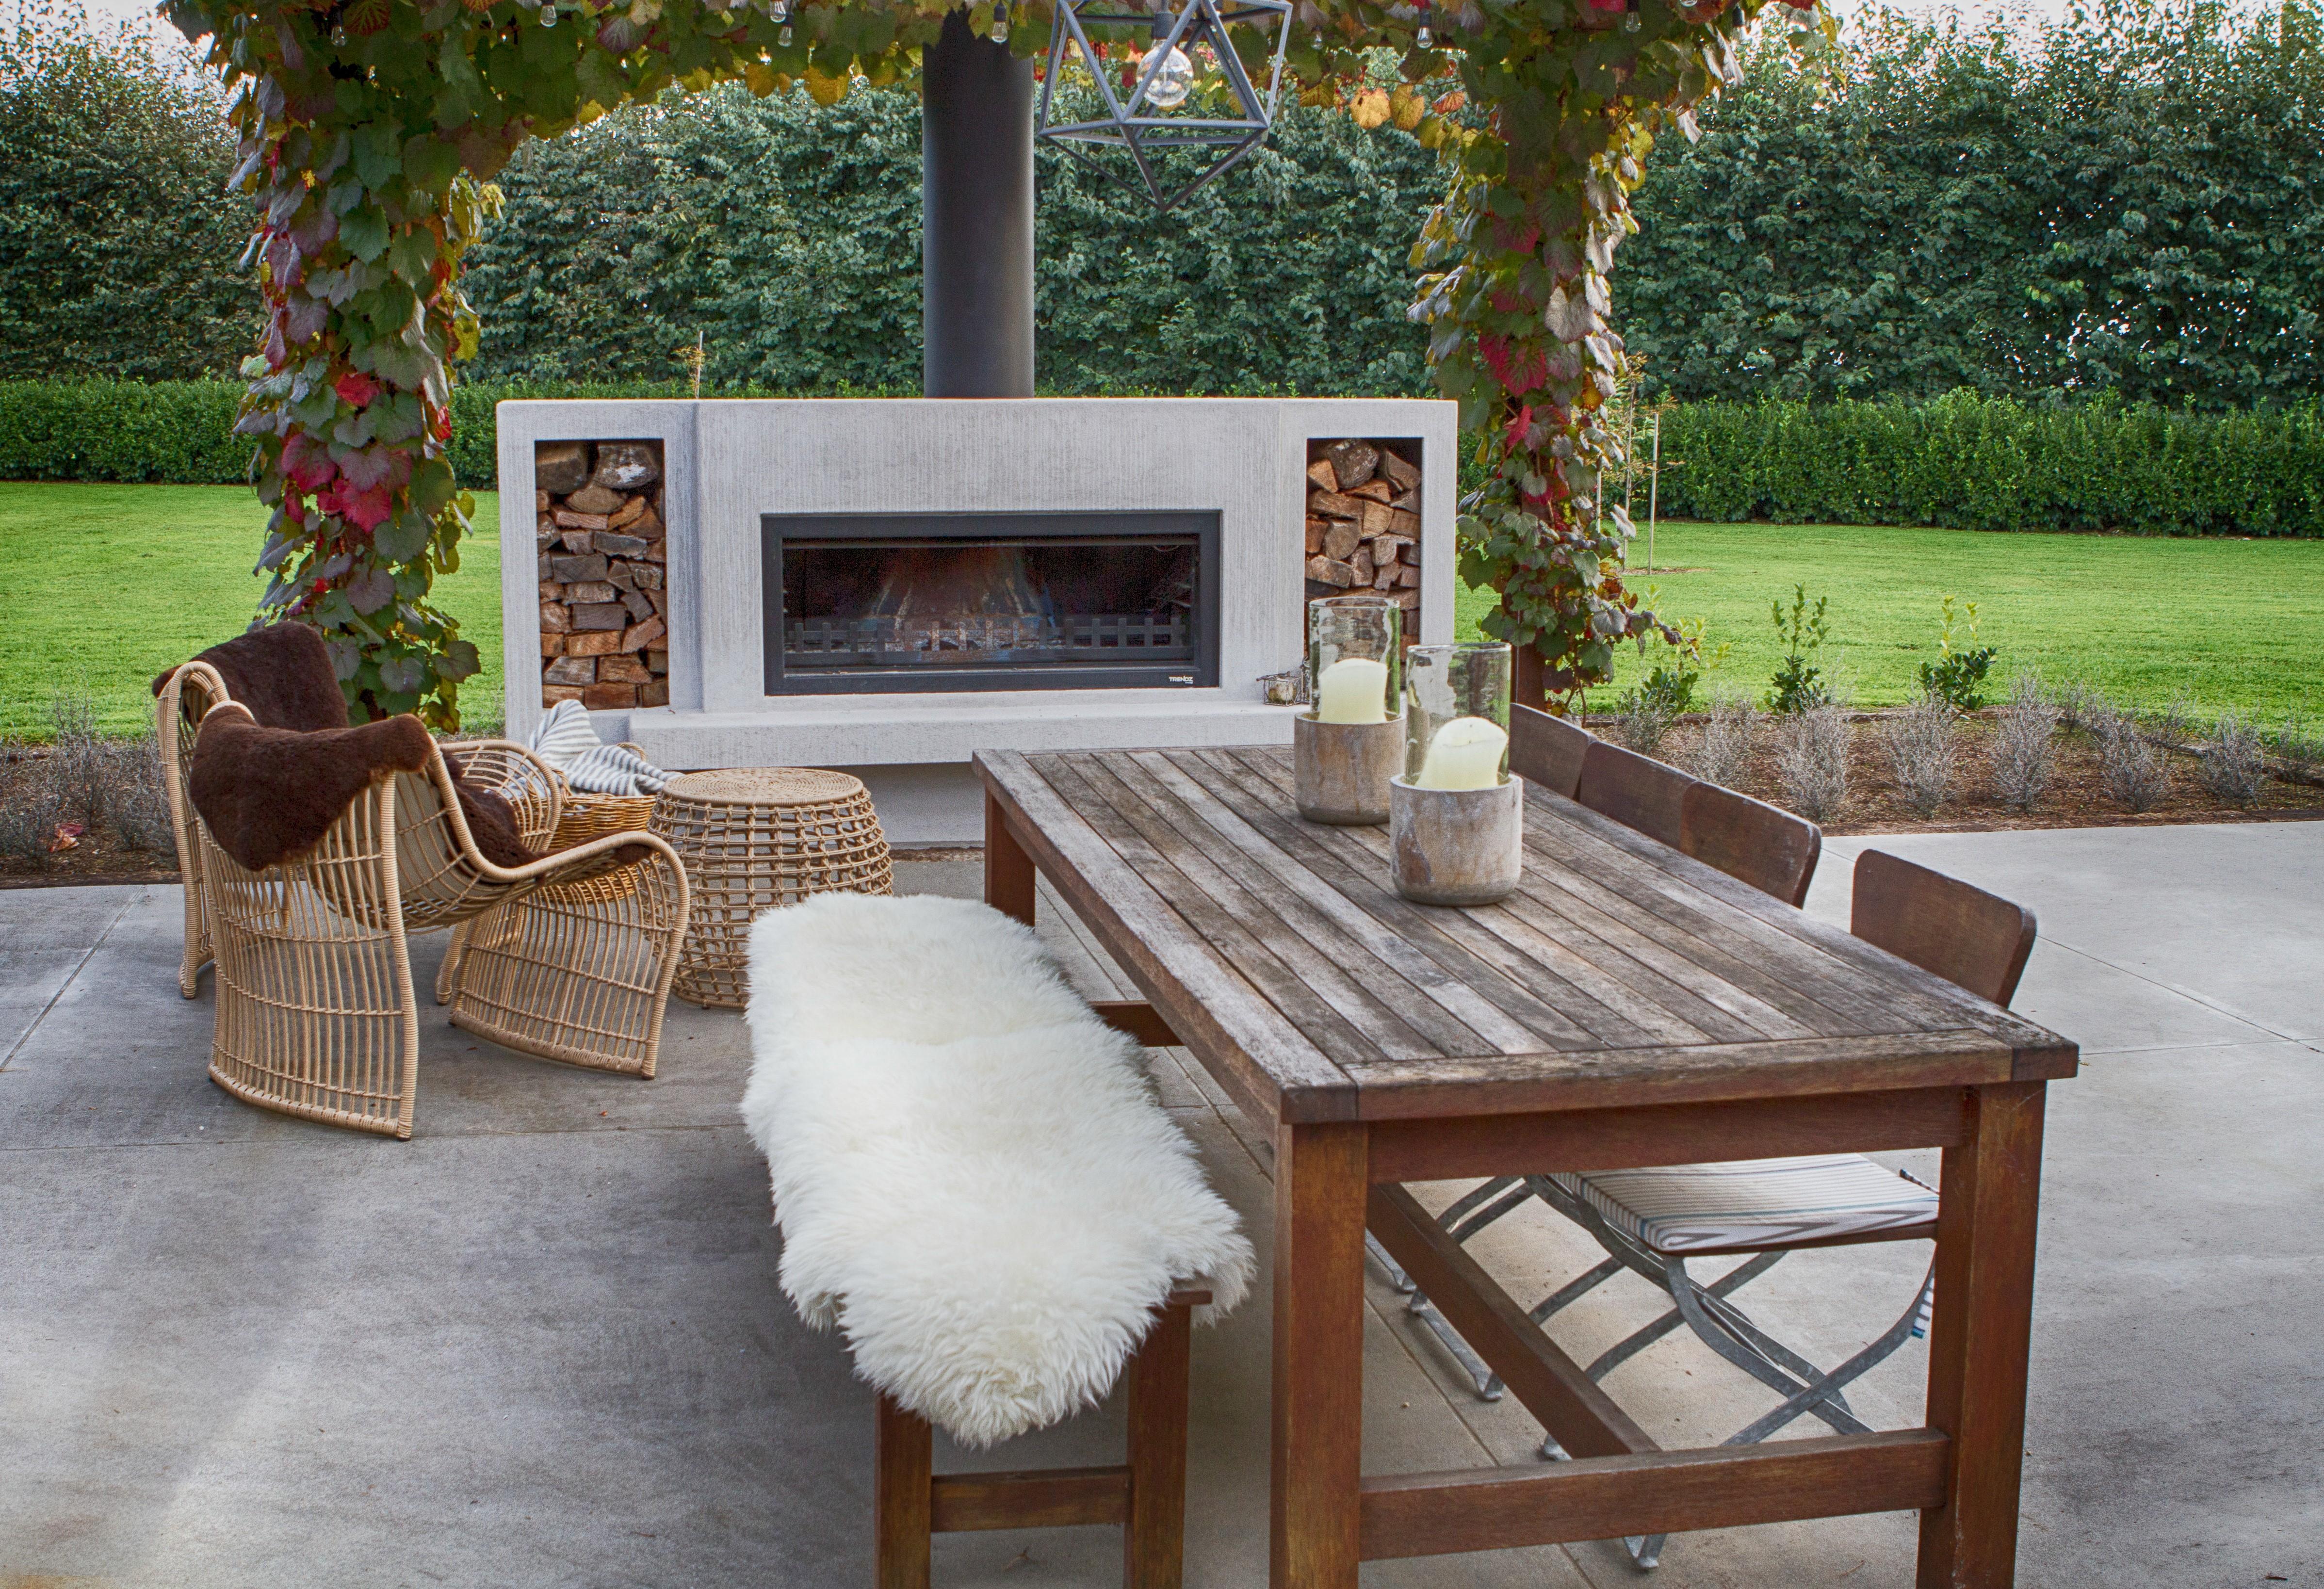 Designer outdoor fireplace from Trendz Outdoors